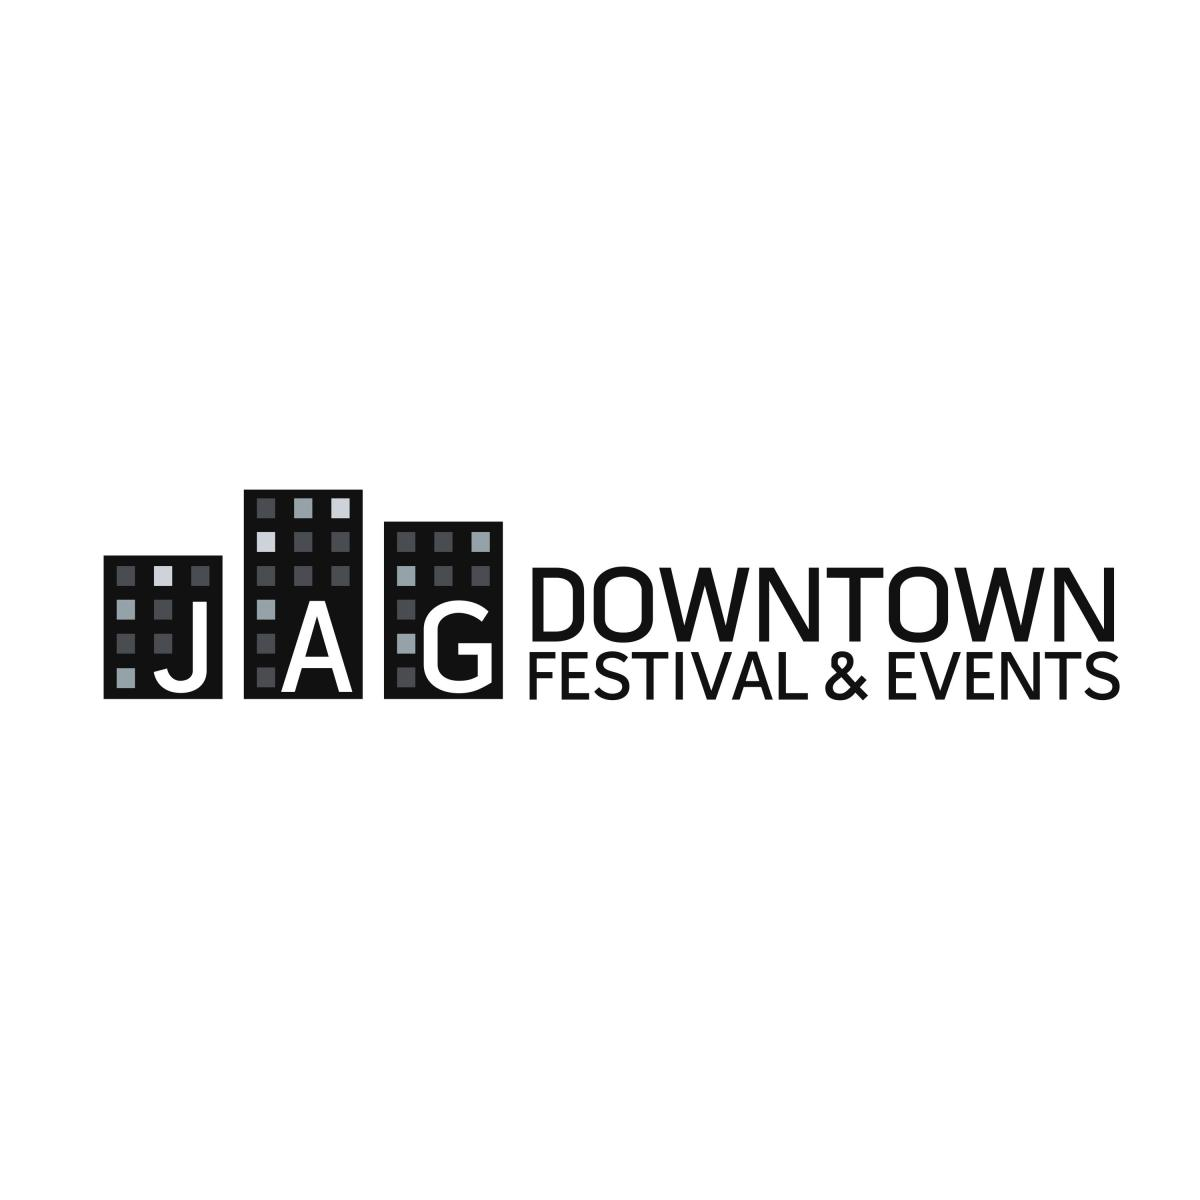 JAG Downtown Festival & Events LLC